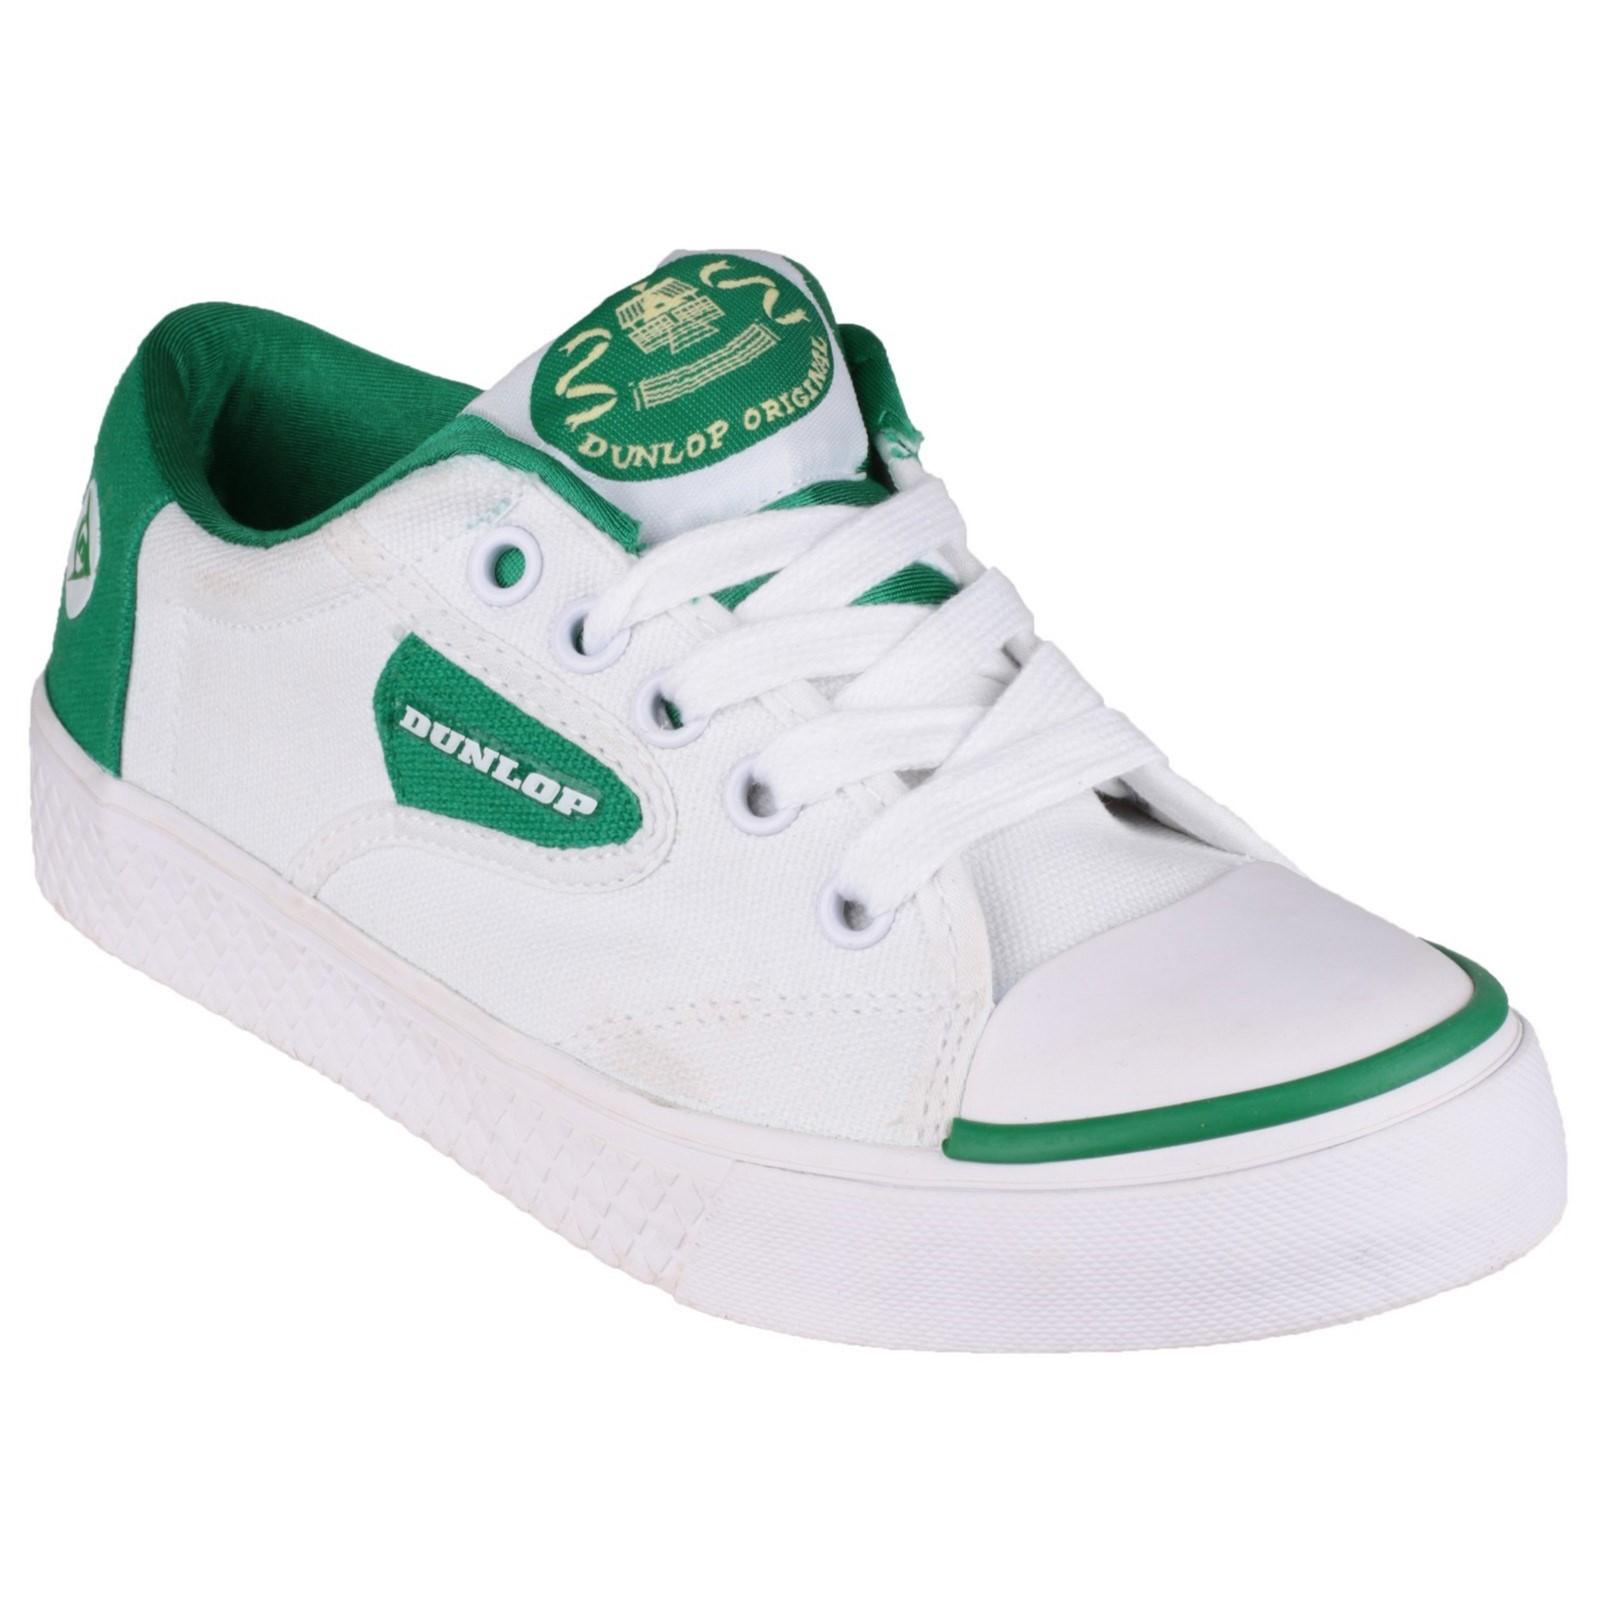 Green Flash Mens Dunlop Flash